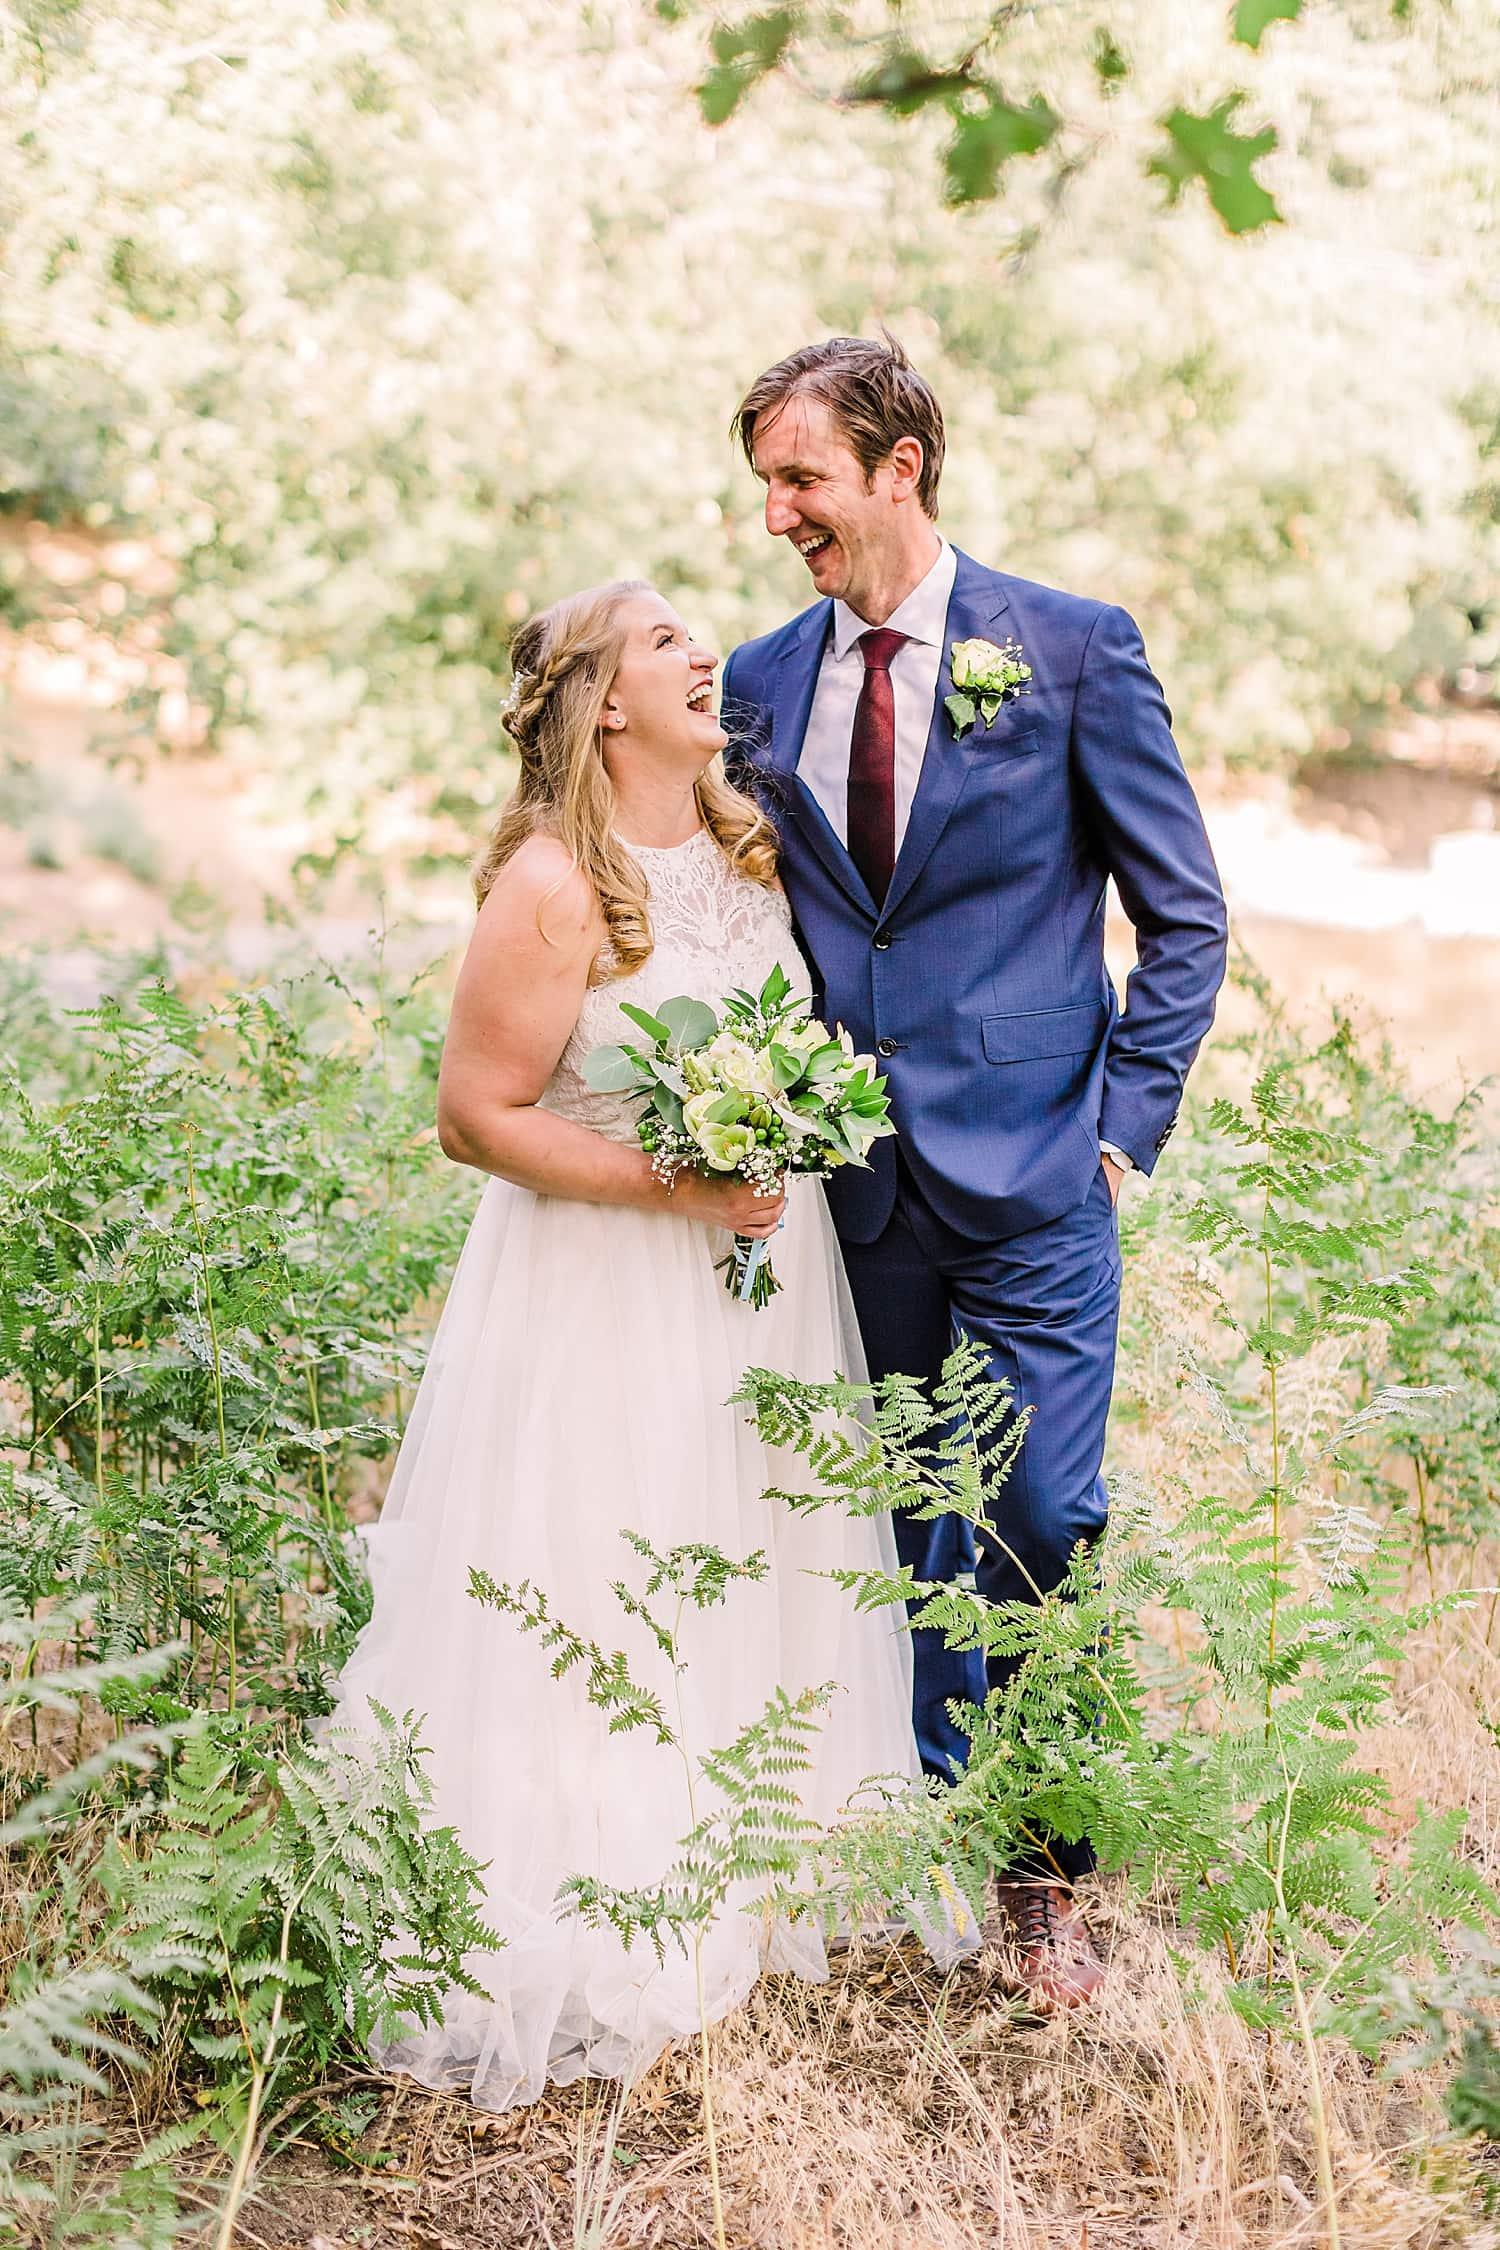 Willow-woods-wedding-lou-eddies-pizza-sky-forest-wedidng-lake-arrowhead-wedding-big-bear-wedding-lake-gregory-san-bernardino-mountains-photographer